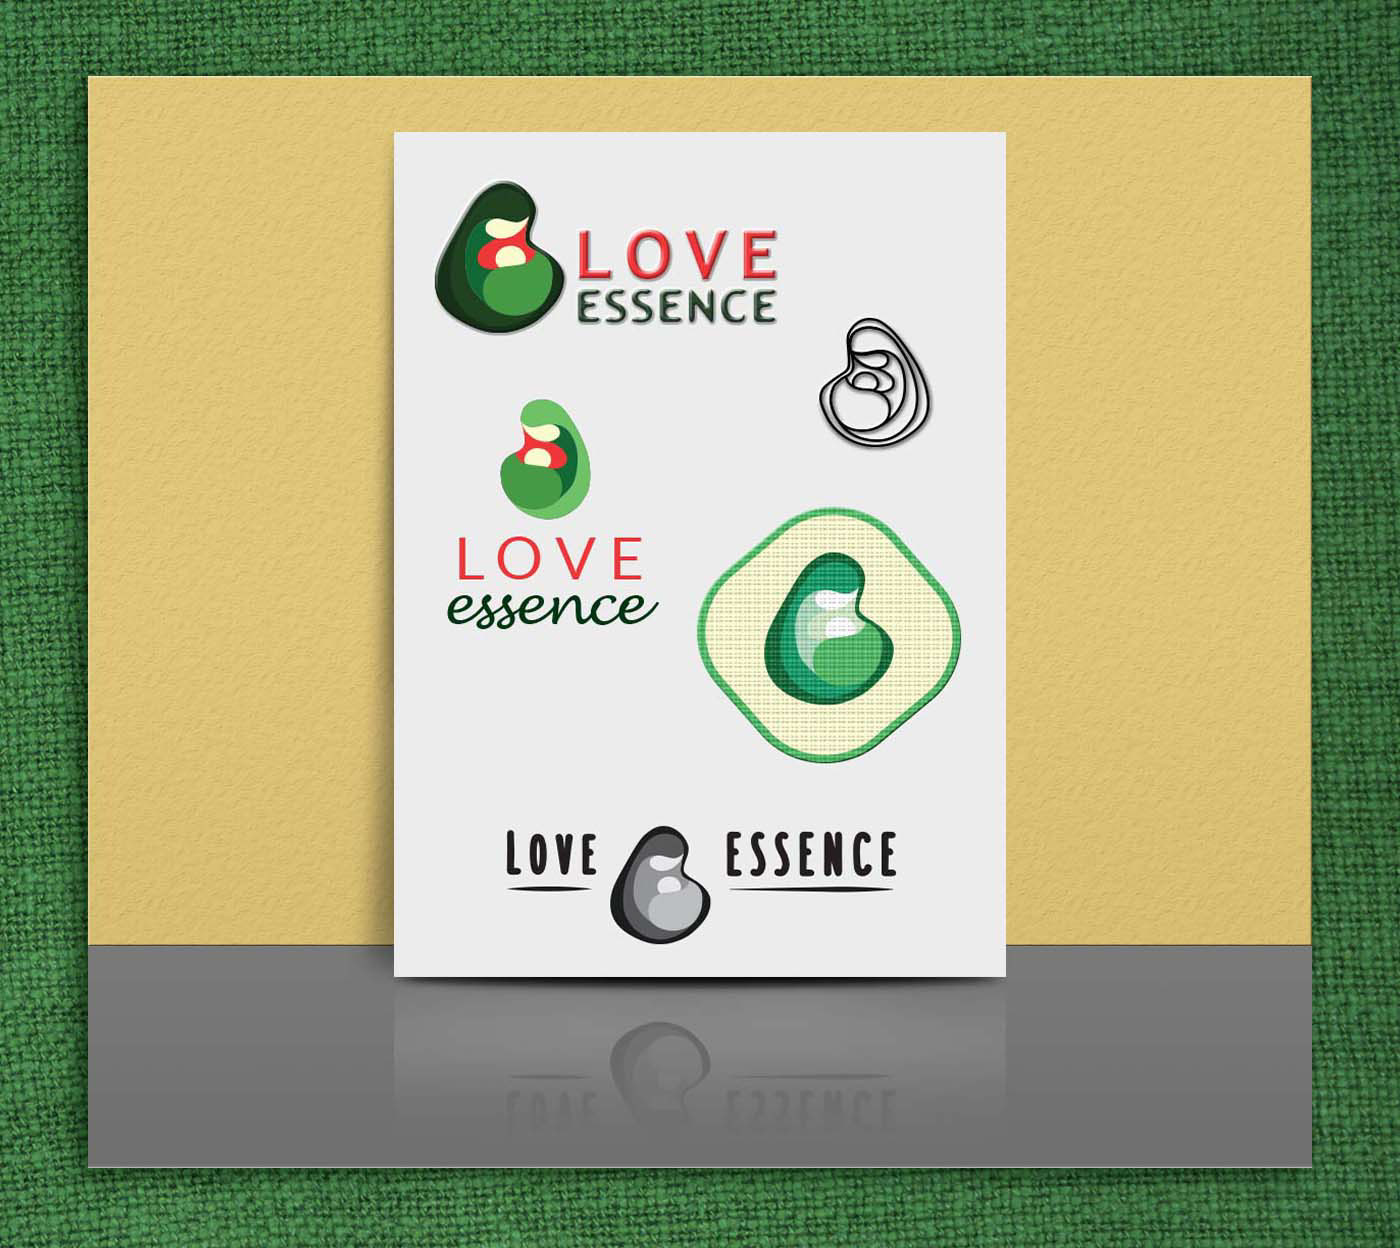 mother Icon logo brand cloth Wrap carrier motherhood Love essence Proximity tenderness parenthood eco Nature